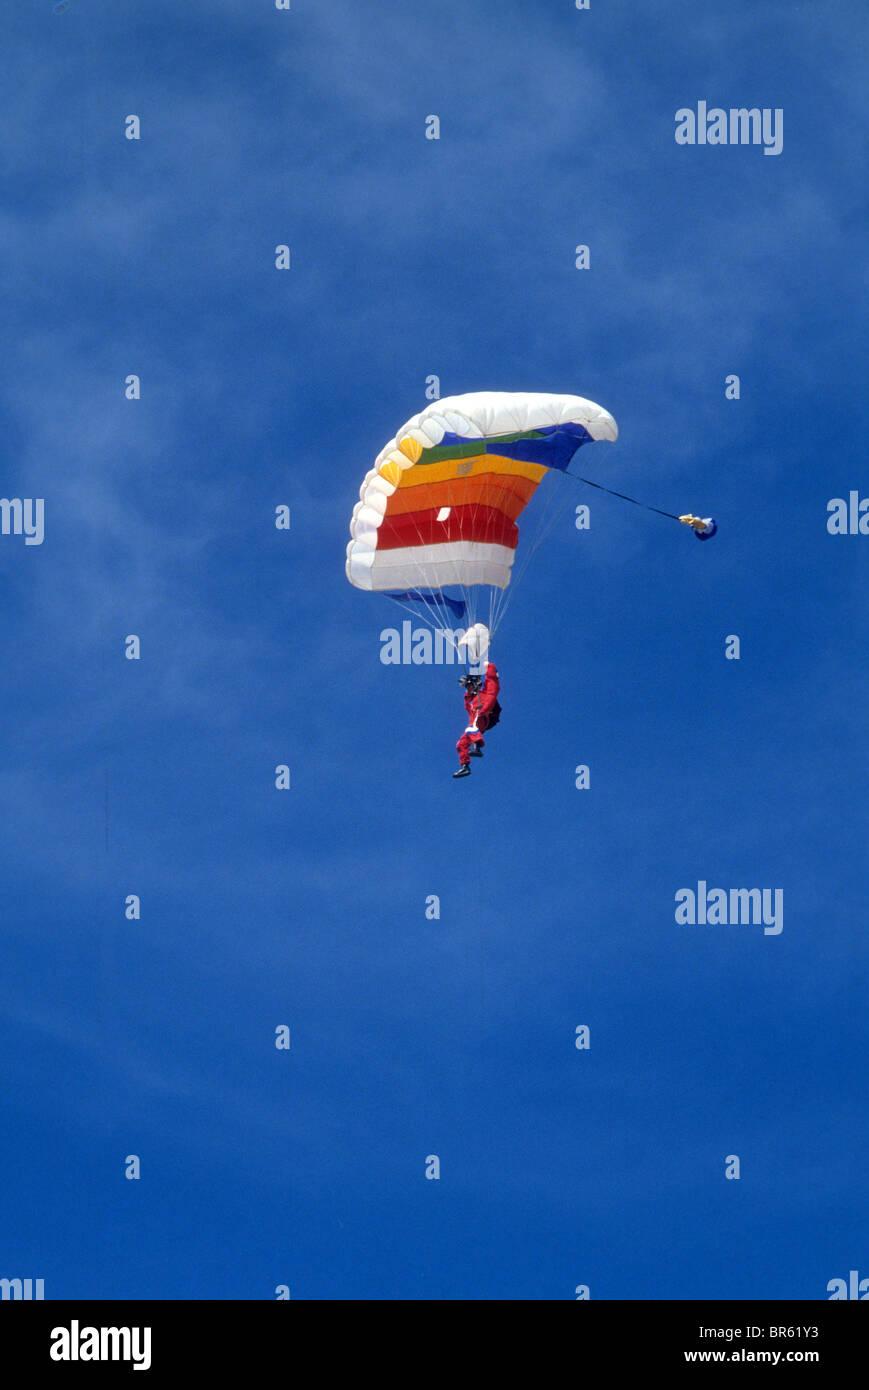 Hang glider hang-glider sport fly parachute wing design